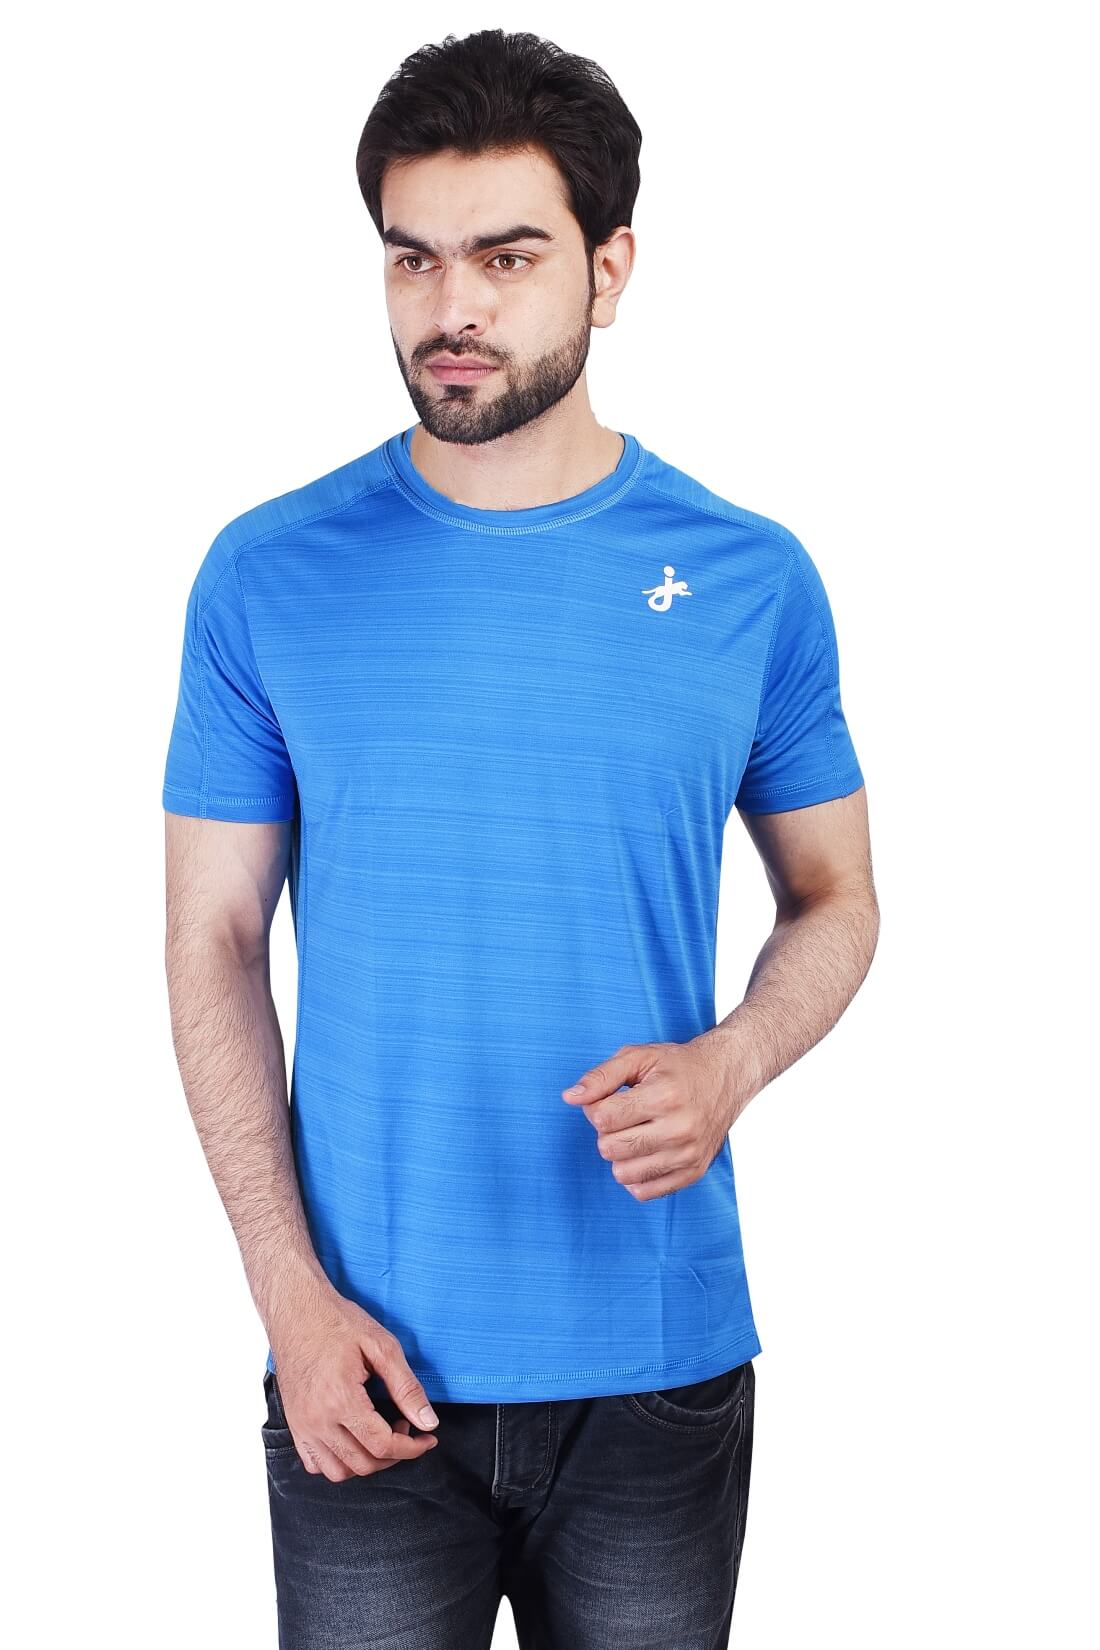 JAGURO | JAGURO Sports T-Shirt.